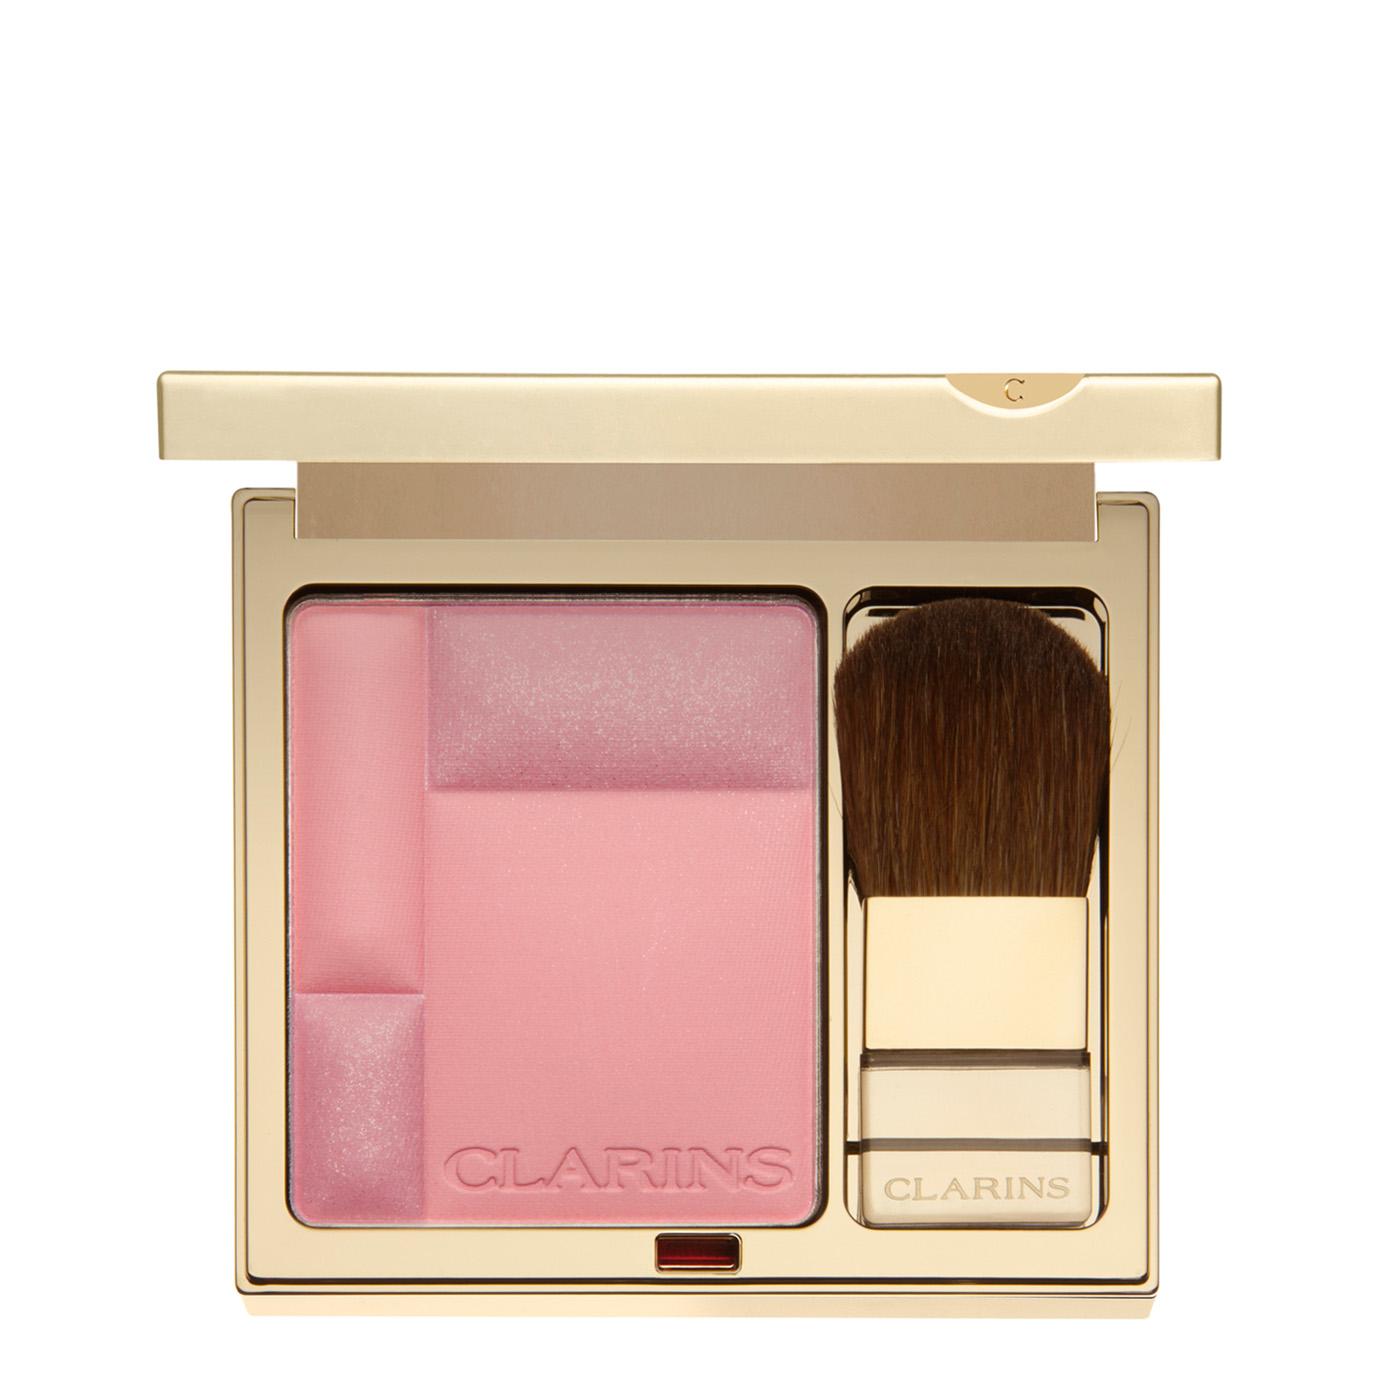 Clarins Blush Illuminating Cheek Colour